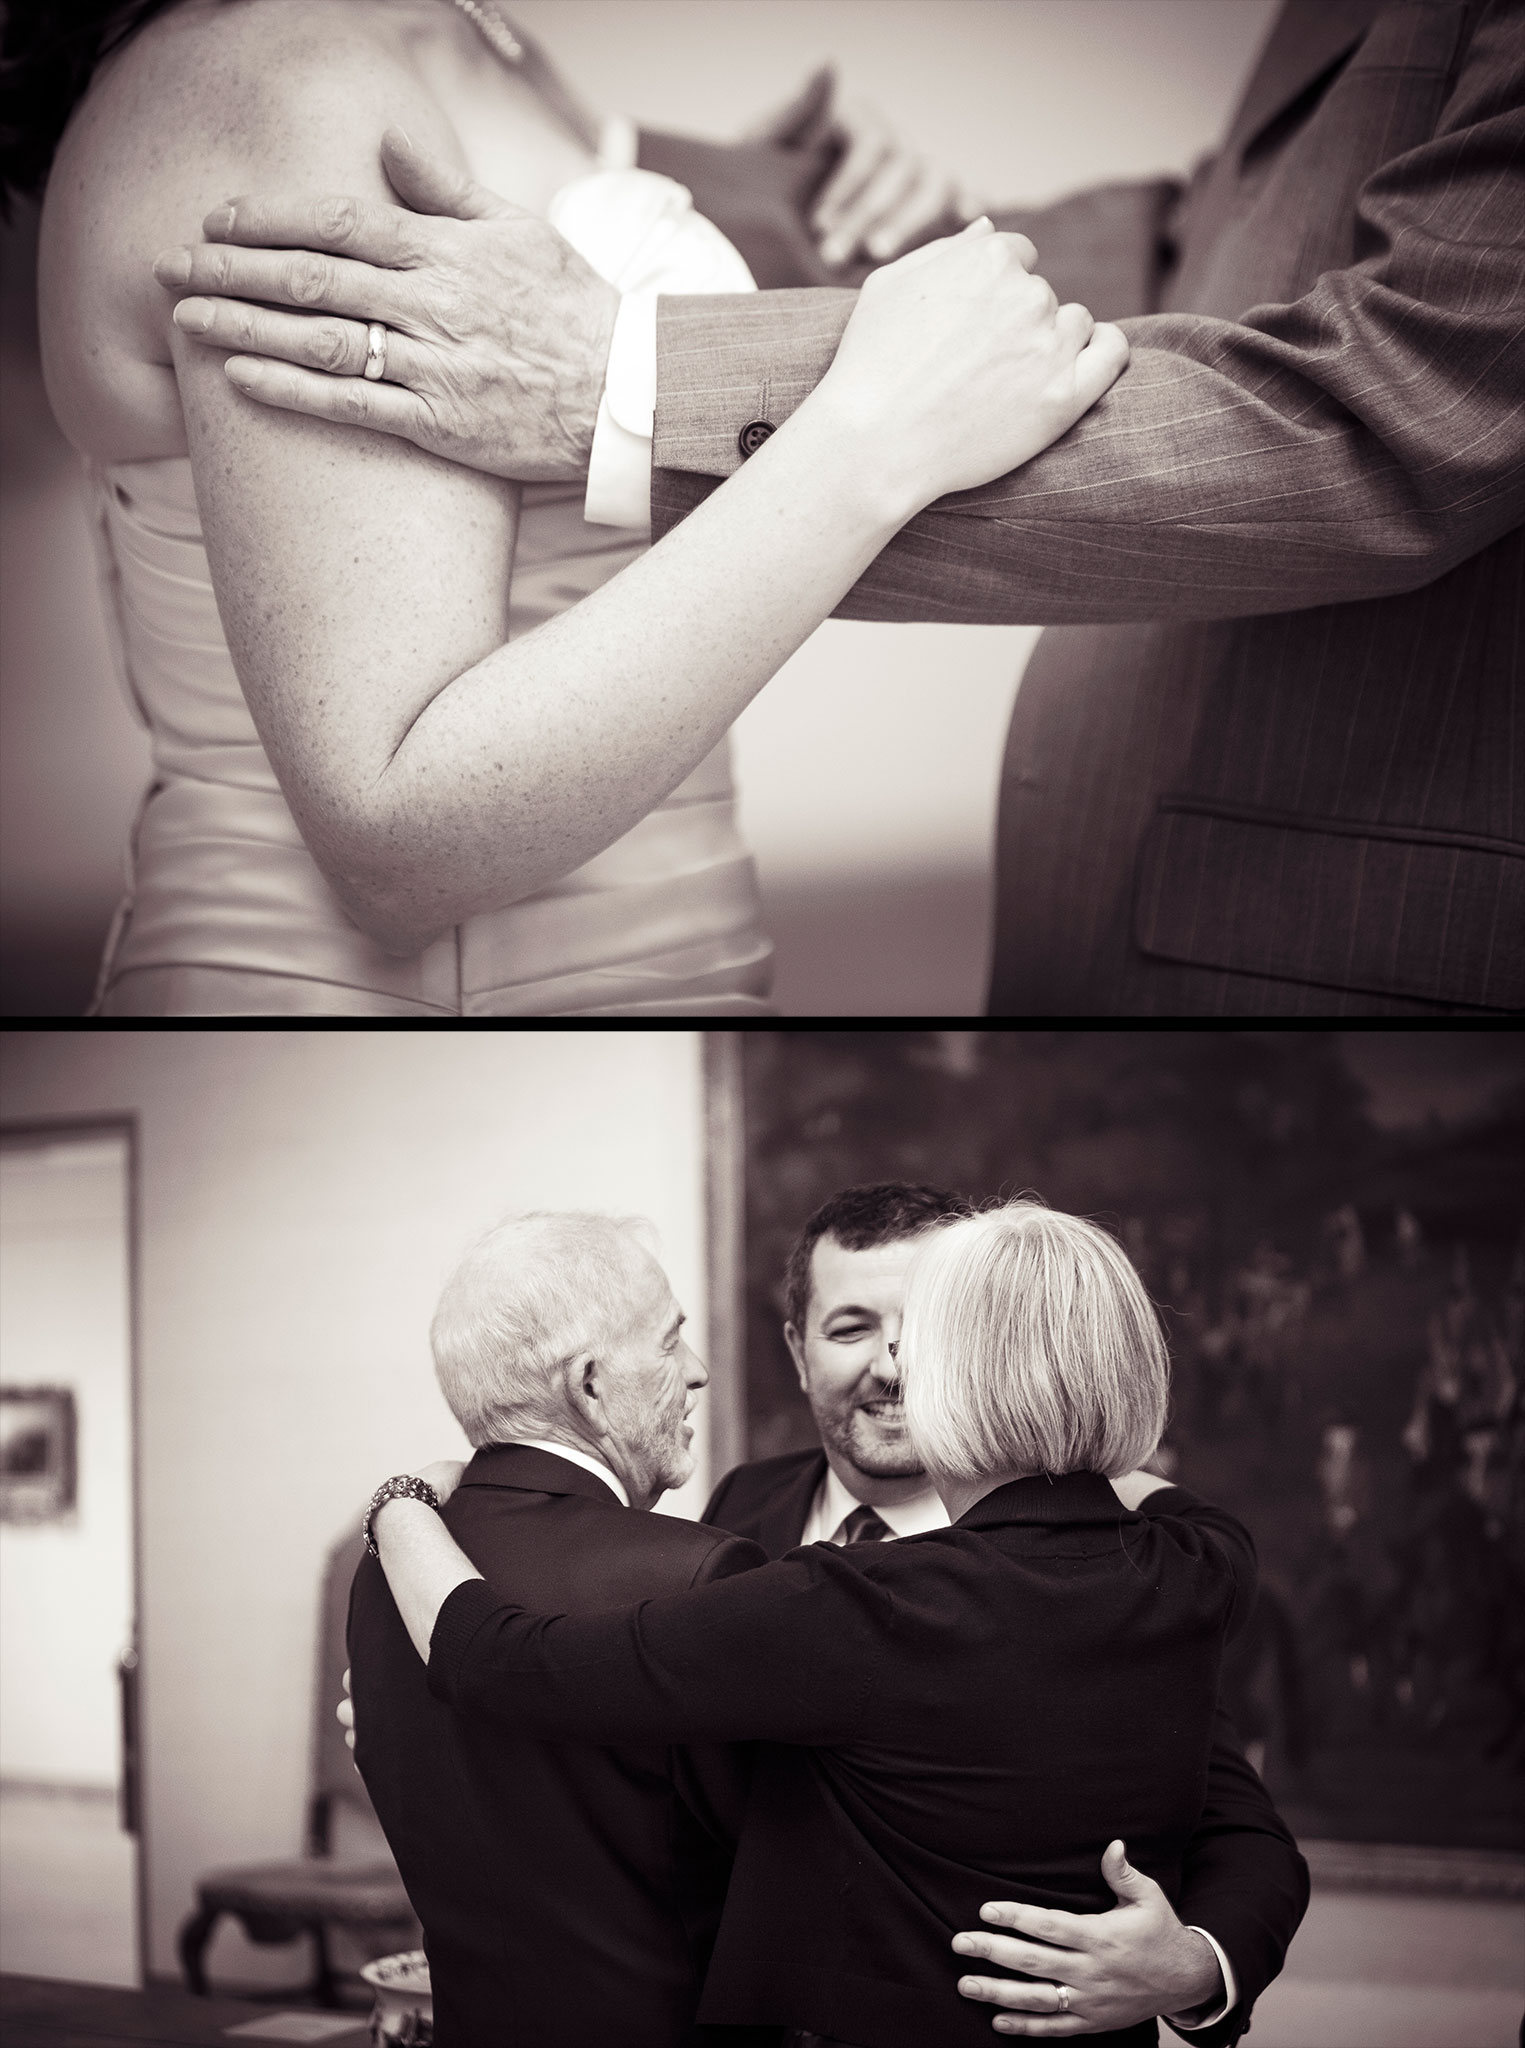 wedding-photographer-toronto-canada-shayne-gray_8620.jpg